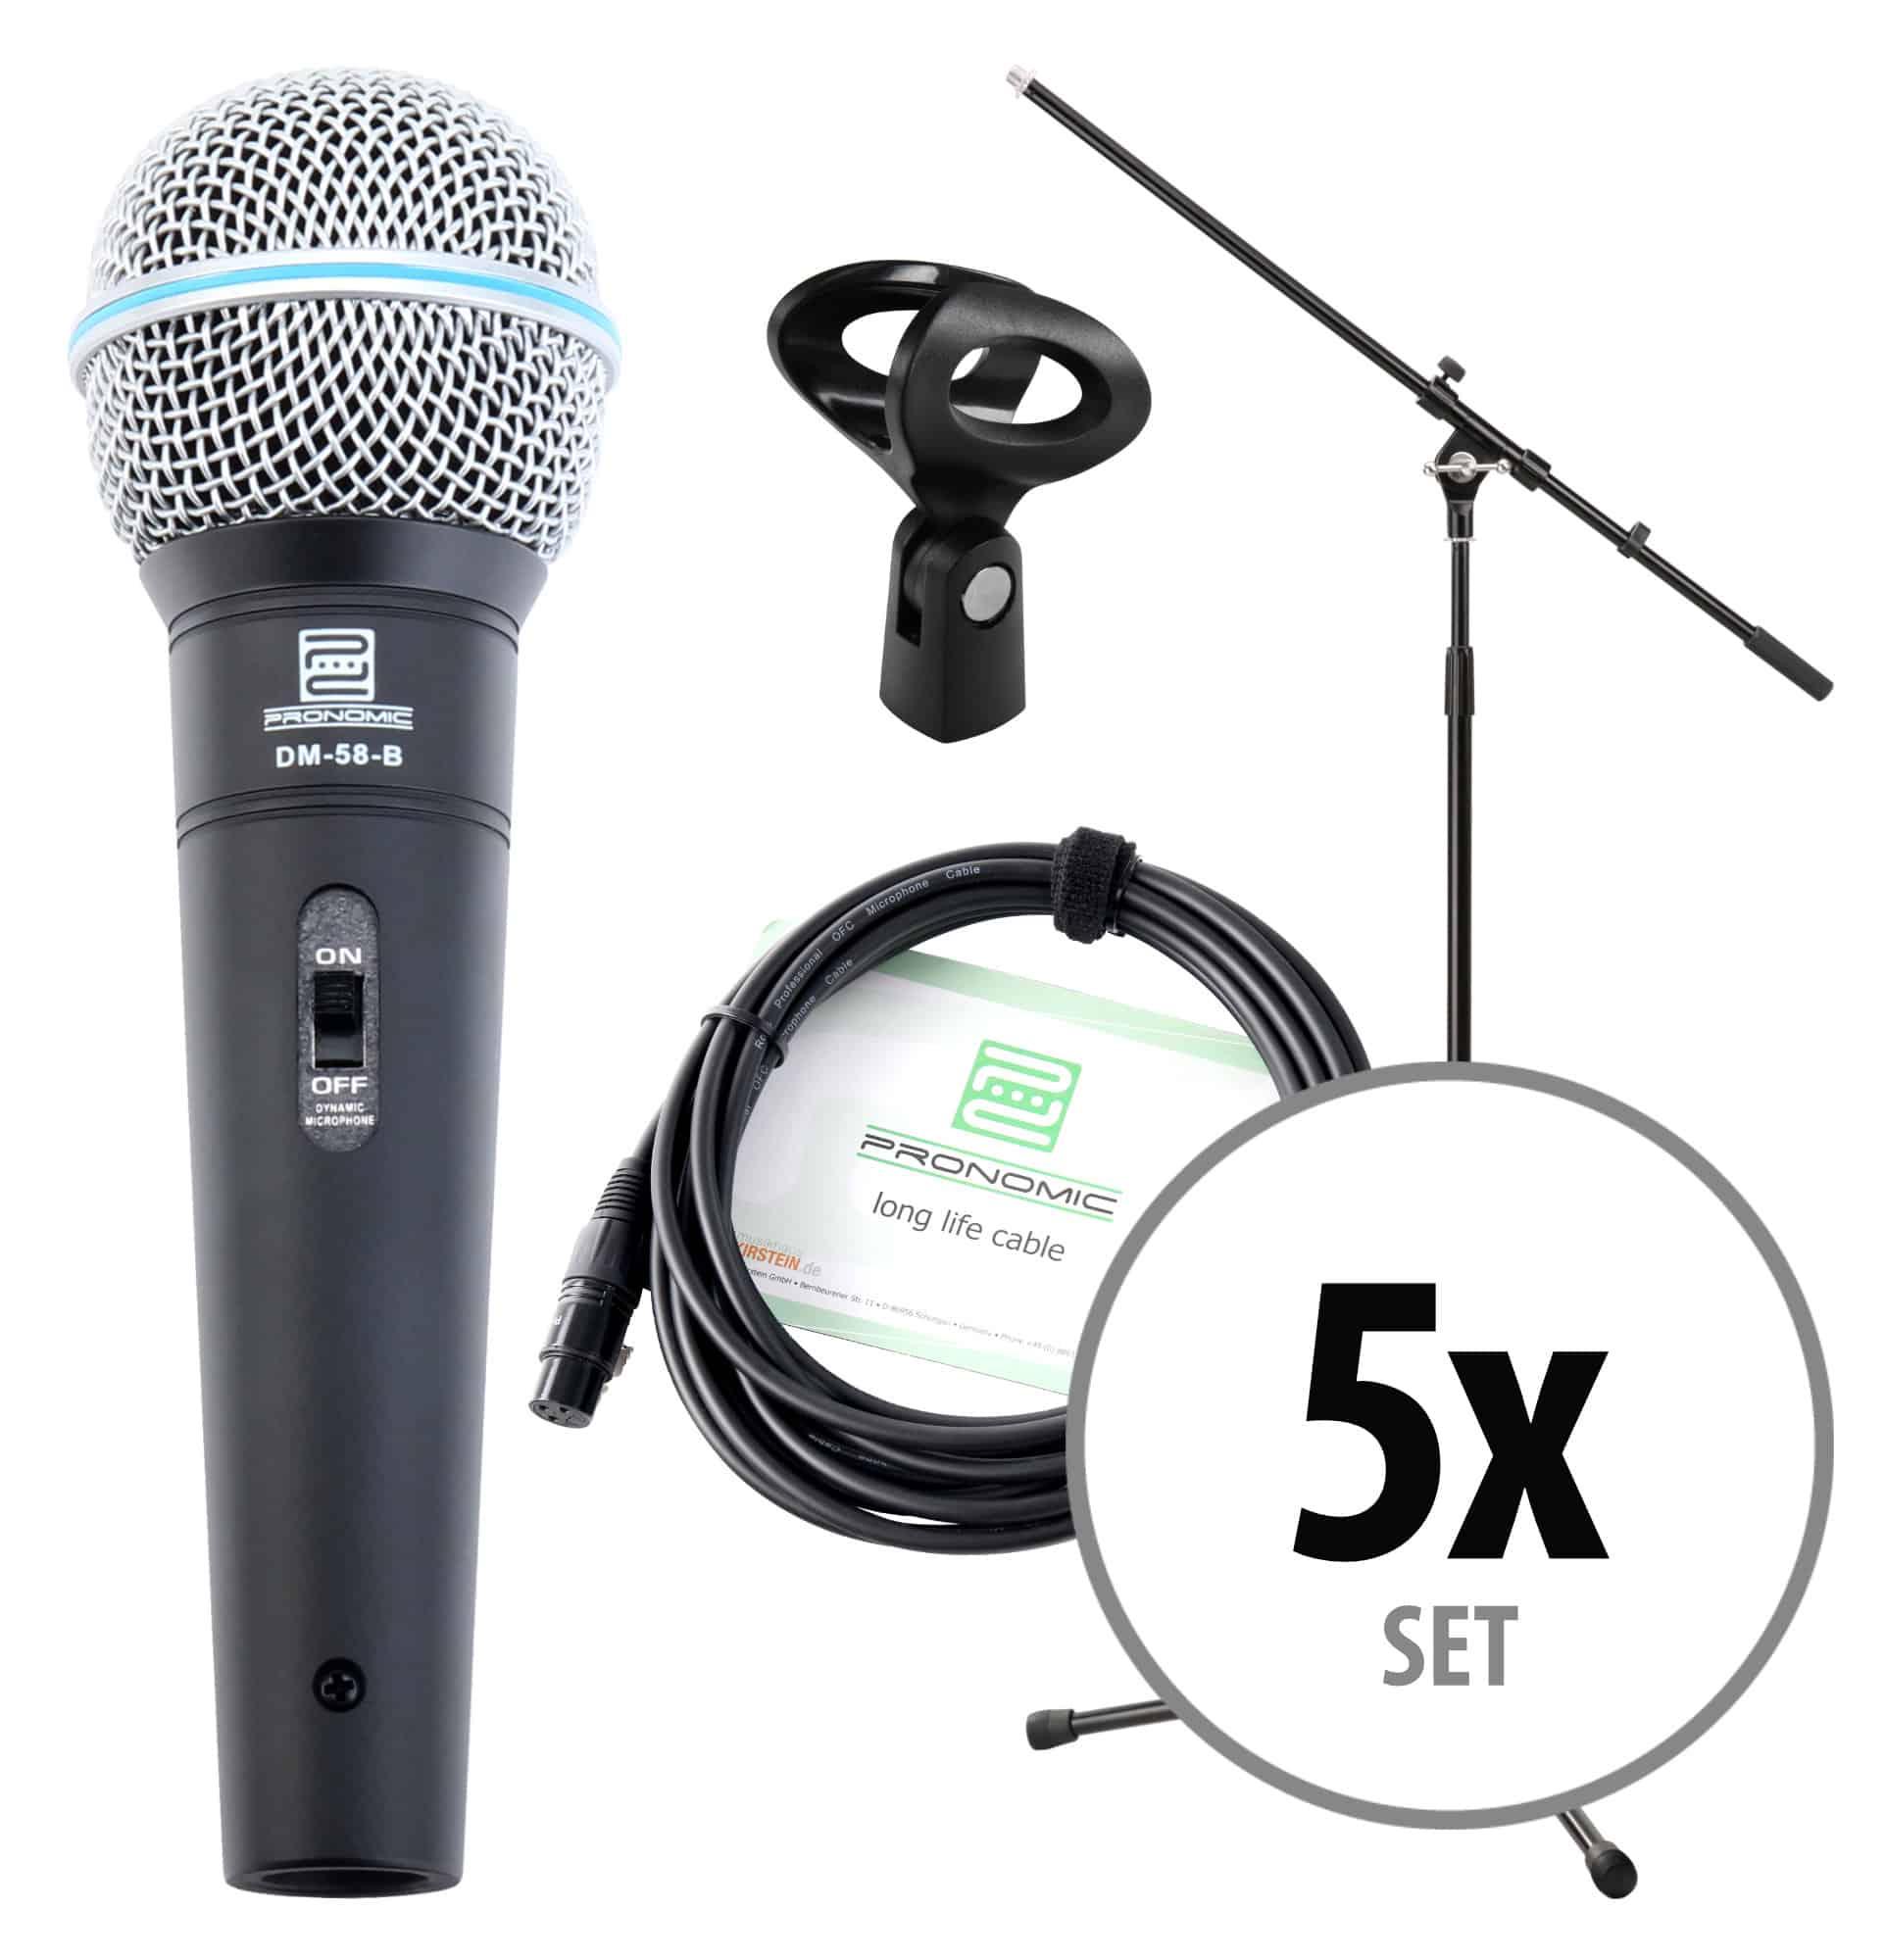 Mikrofone - Pronomic DM 58 B Vocal Mikrofon Starter Set 5x Mikro, XLR Kabel, Klemme, Stativ - Onlineshop Musikhaus Kirstein